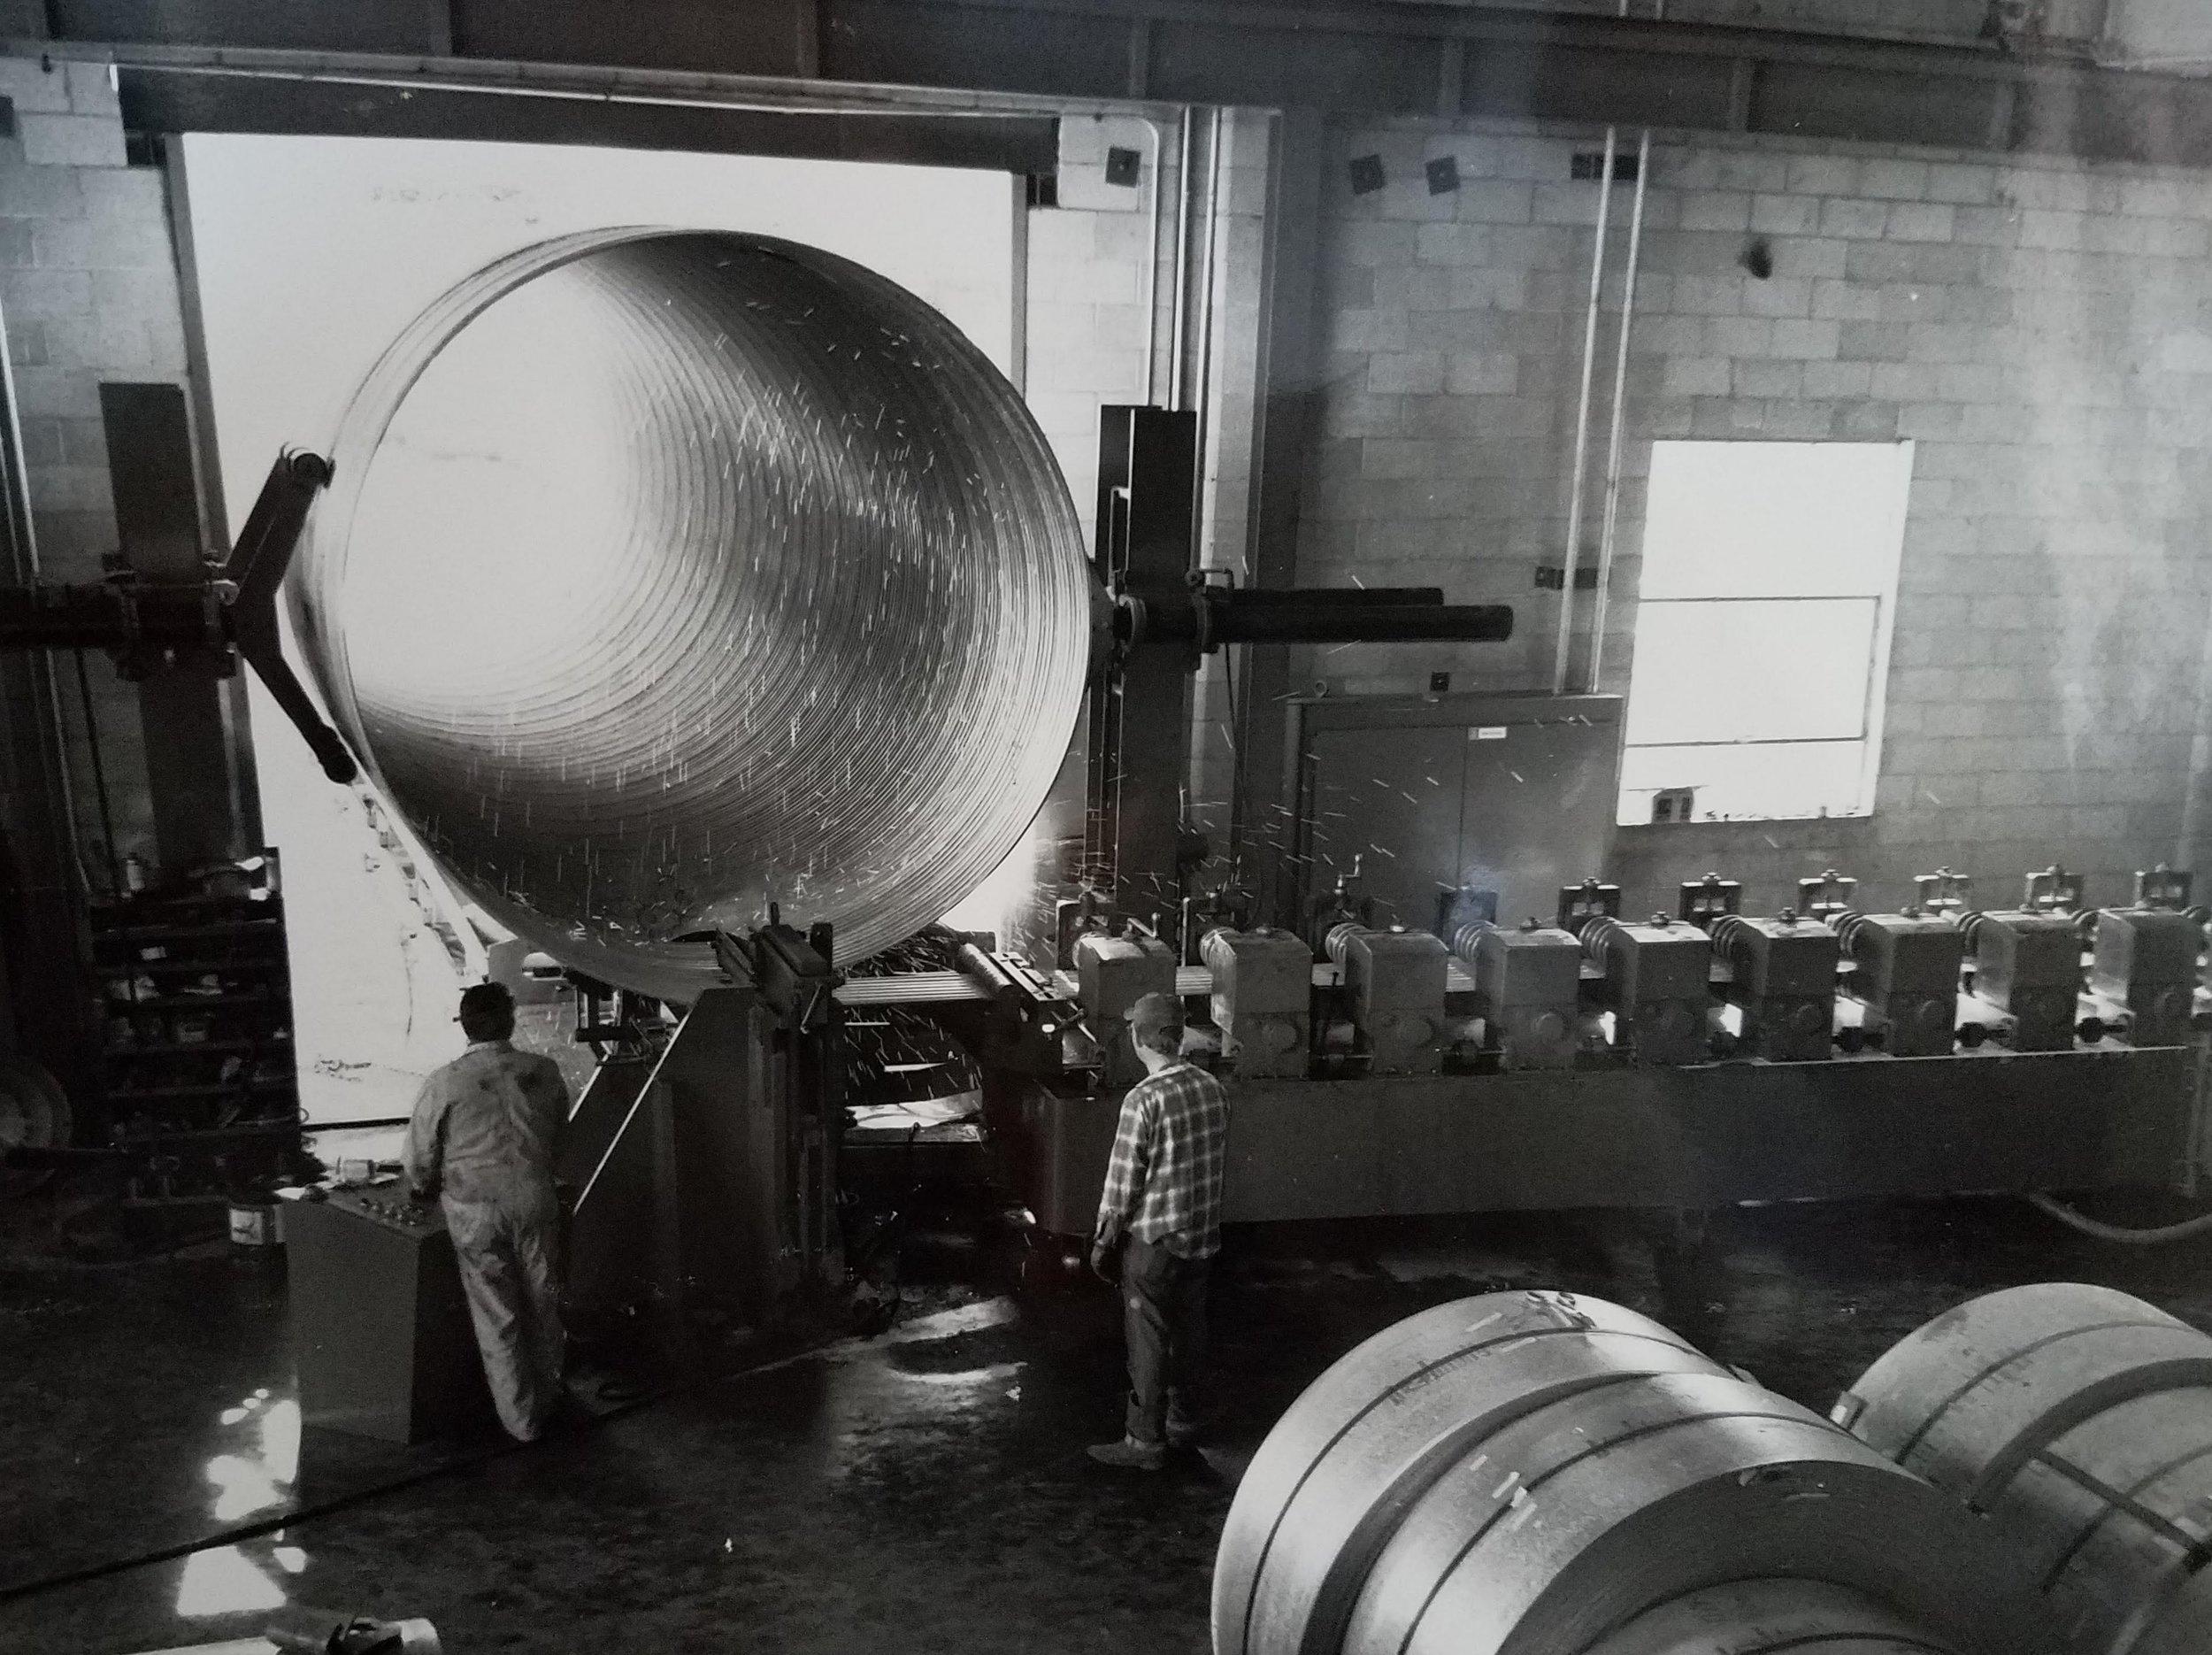 Culvert manufacturing plant, True North Steel, Huron, South Dakota.